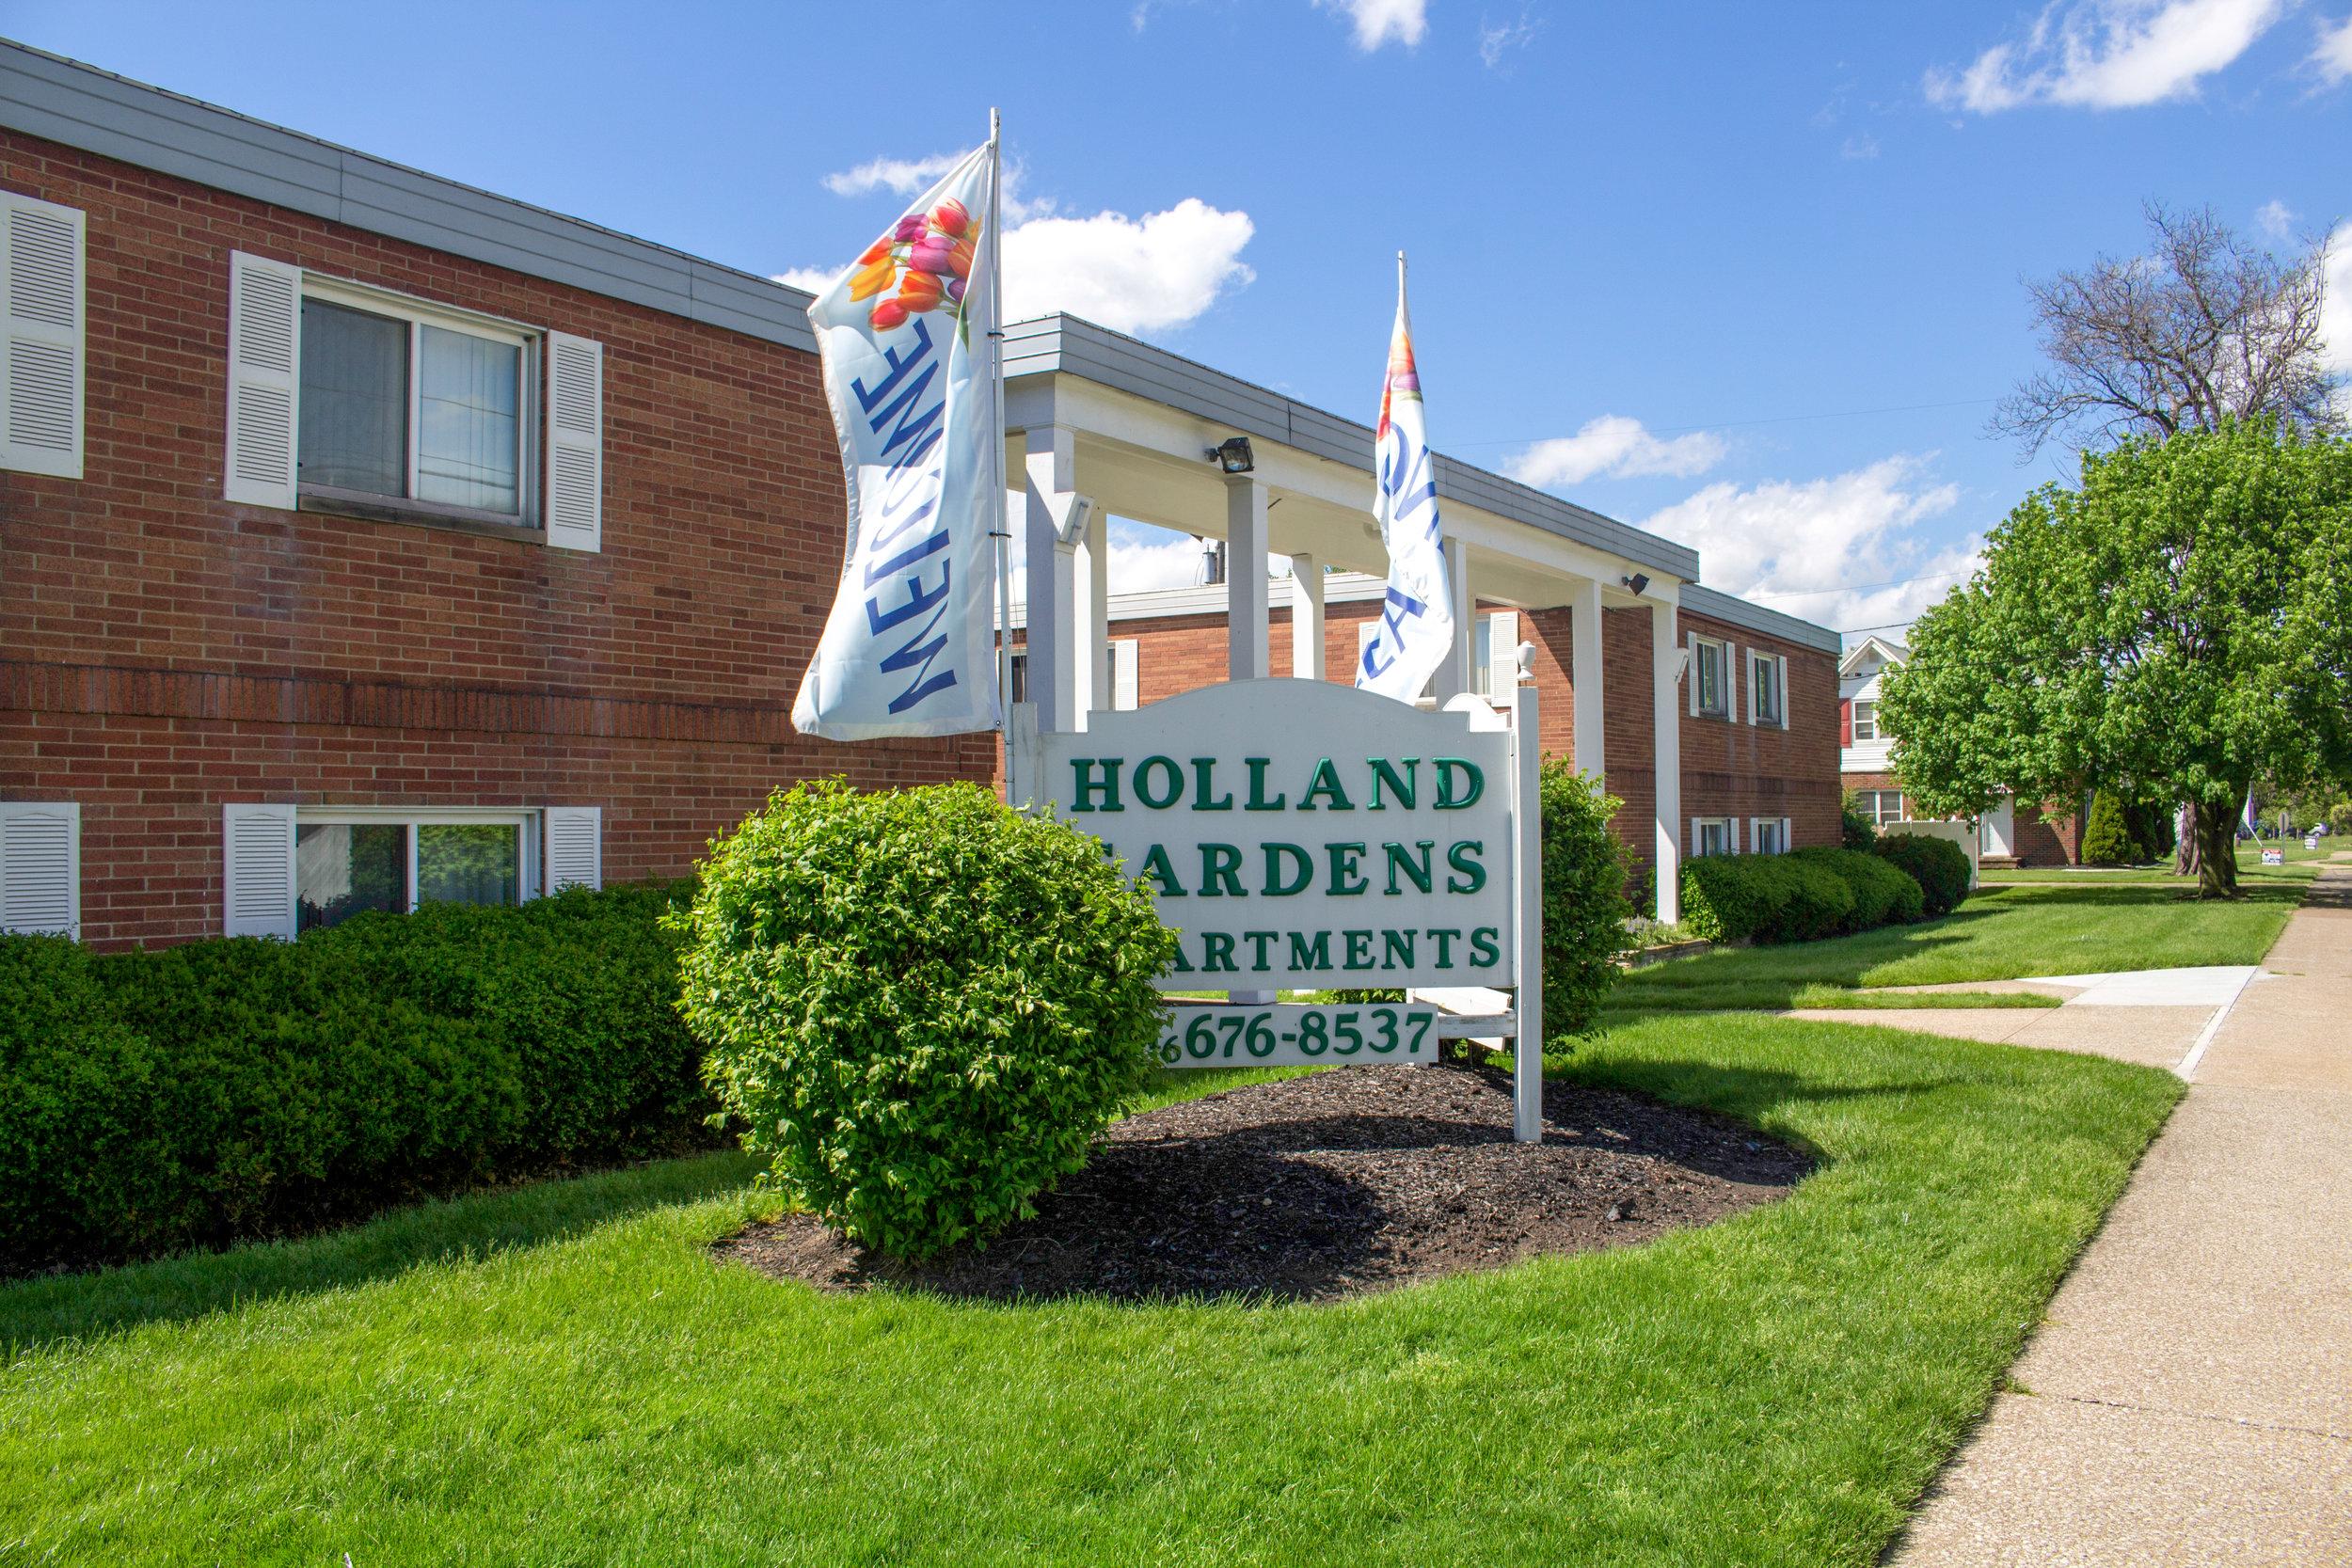 Holland Gardens Apartments - Brook Park, Ohio